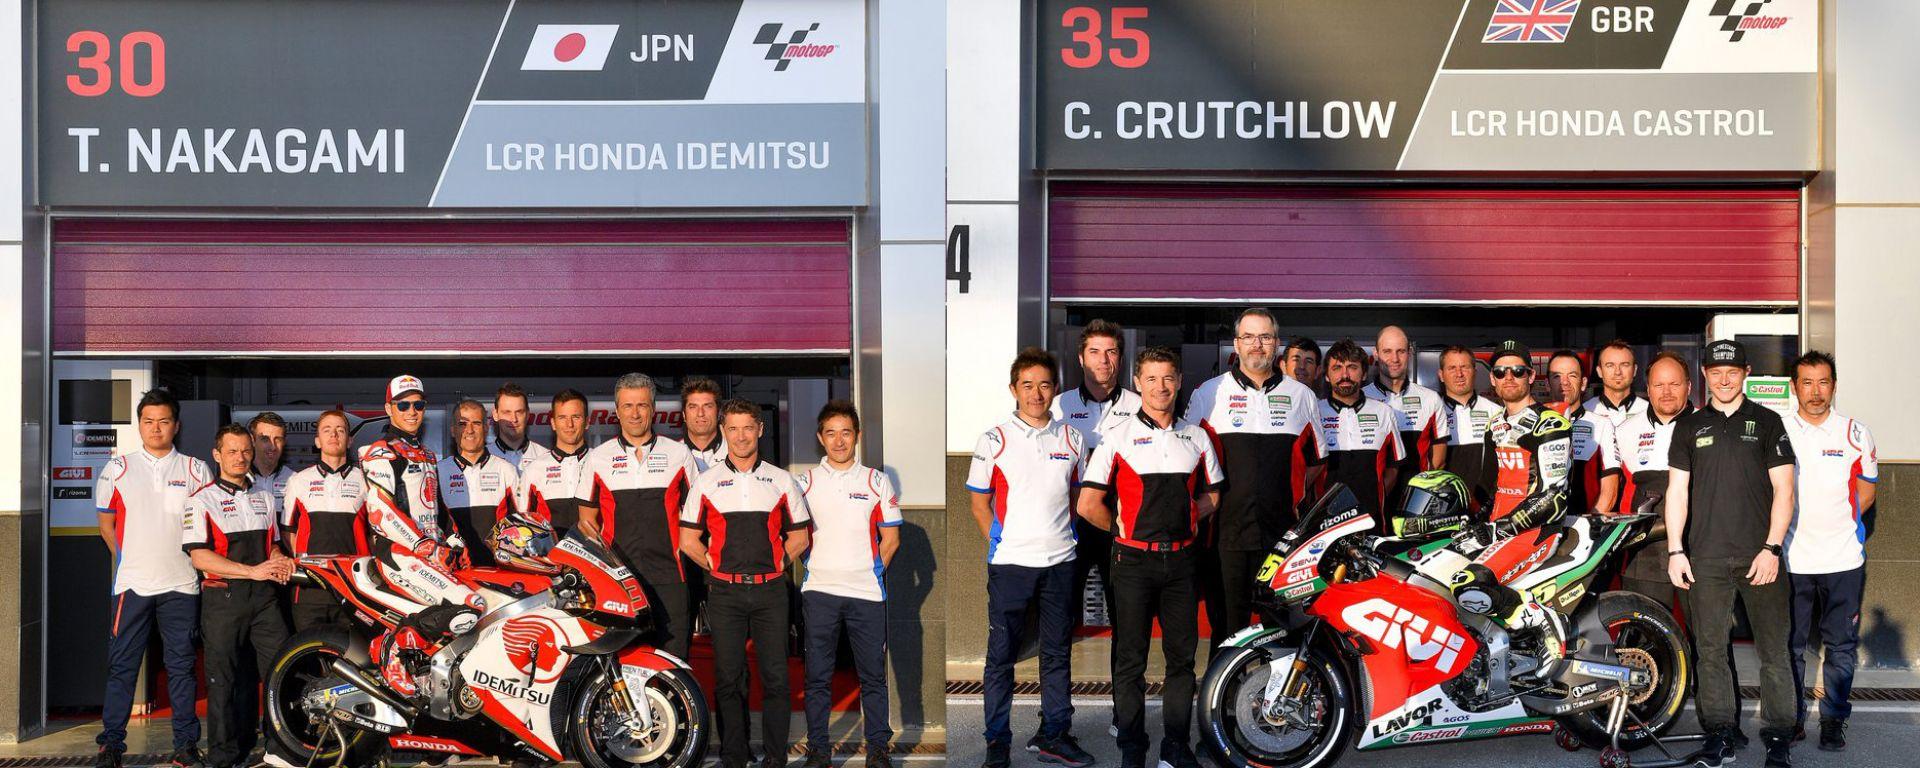 MotoGP 2019, LCR Honda